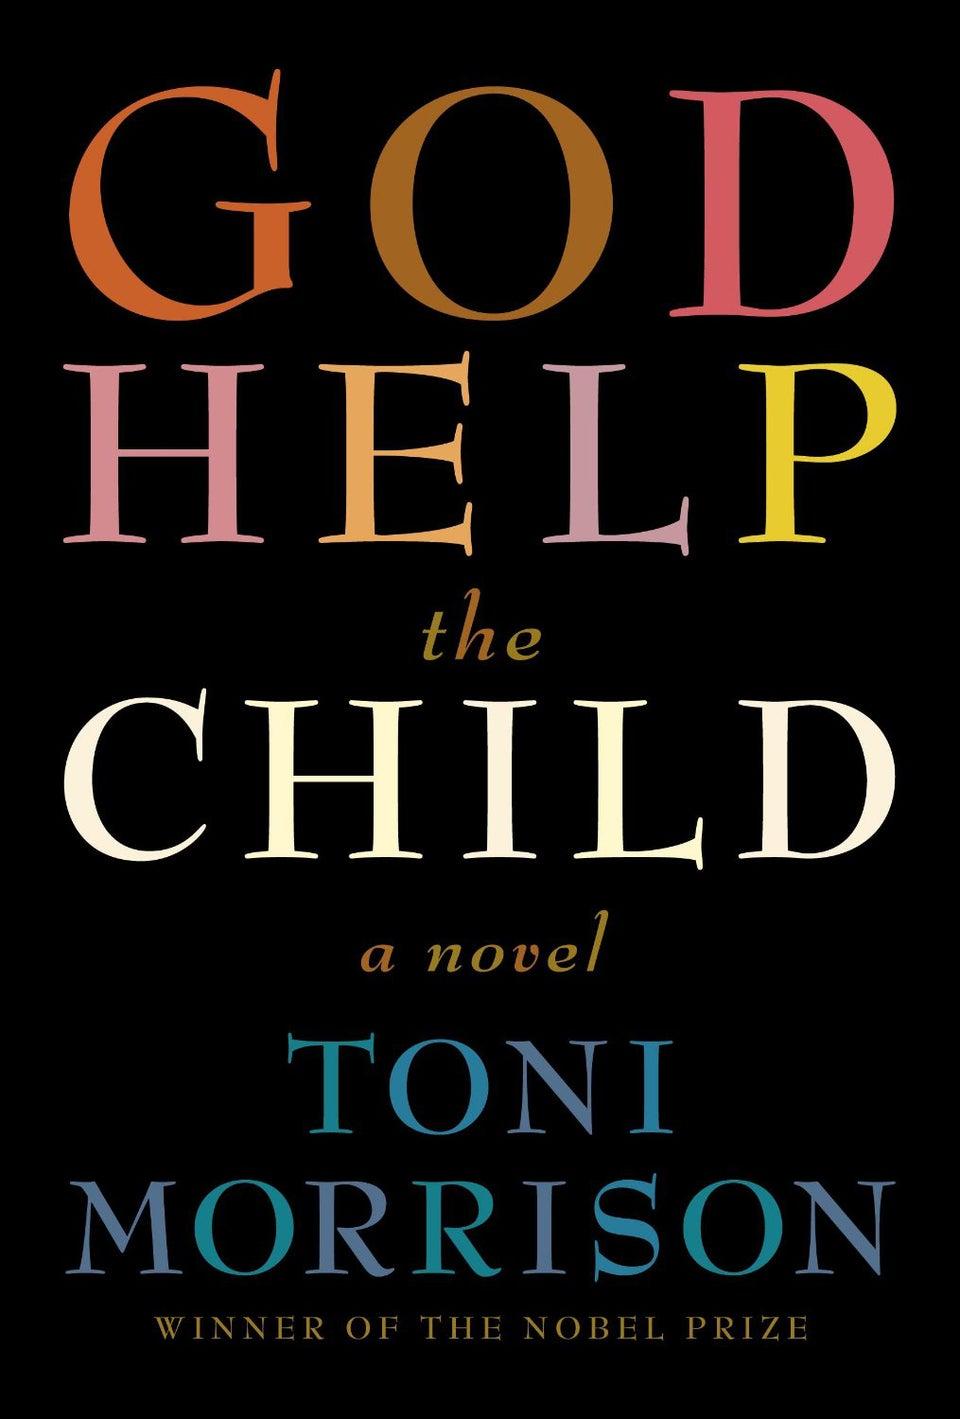 REVIEW: Toni Morrison's Latest Novel, 'God Help the Child,' Mesmerizes Readers